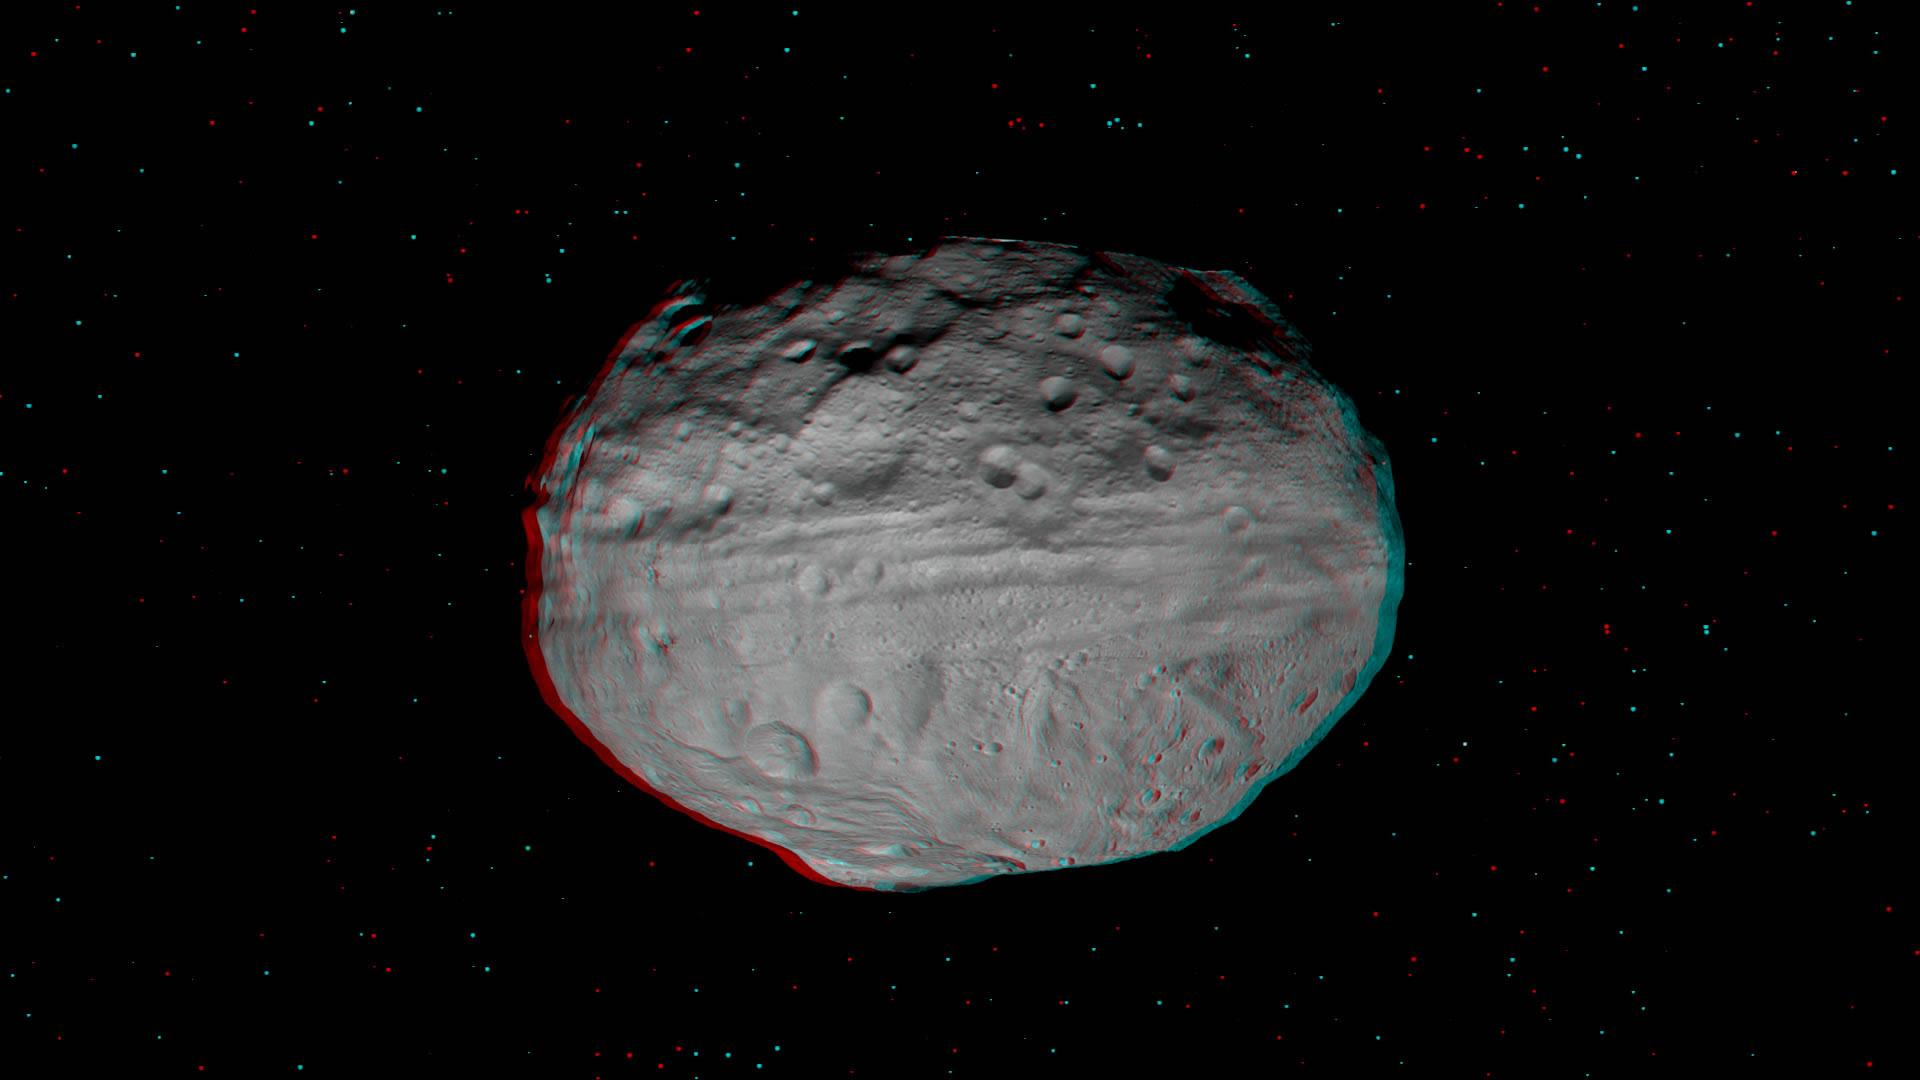 Asteroid DA 14